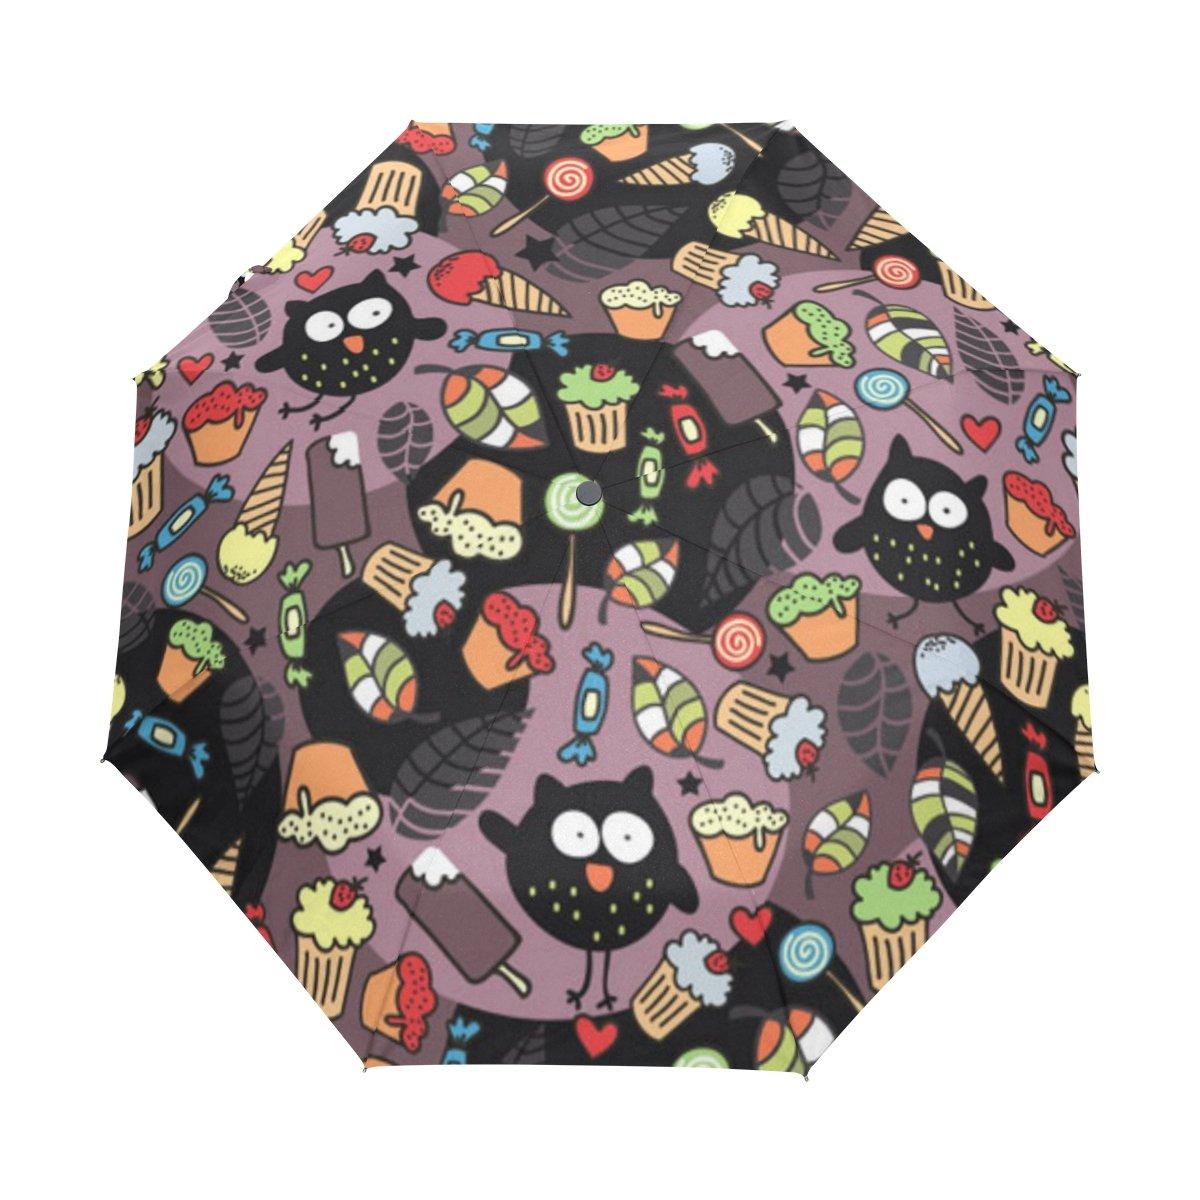 naanle Crazy Owls DessertsキャンディアイスクリームケーキAuto Open Close折りたたみ式傘 B076HTZXJ1